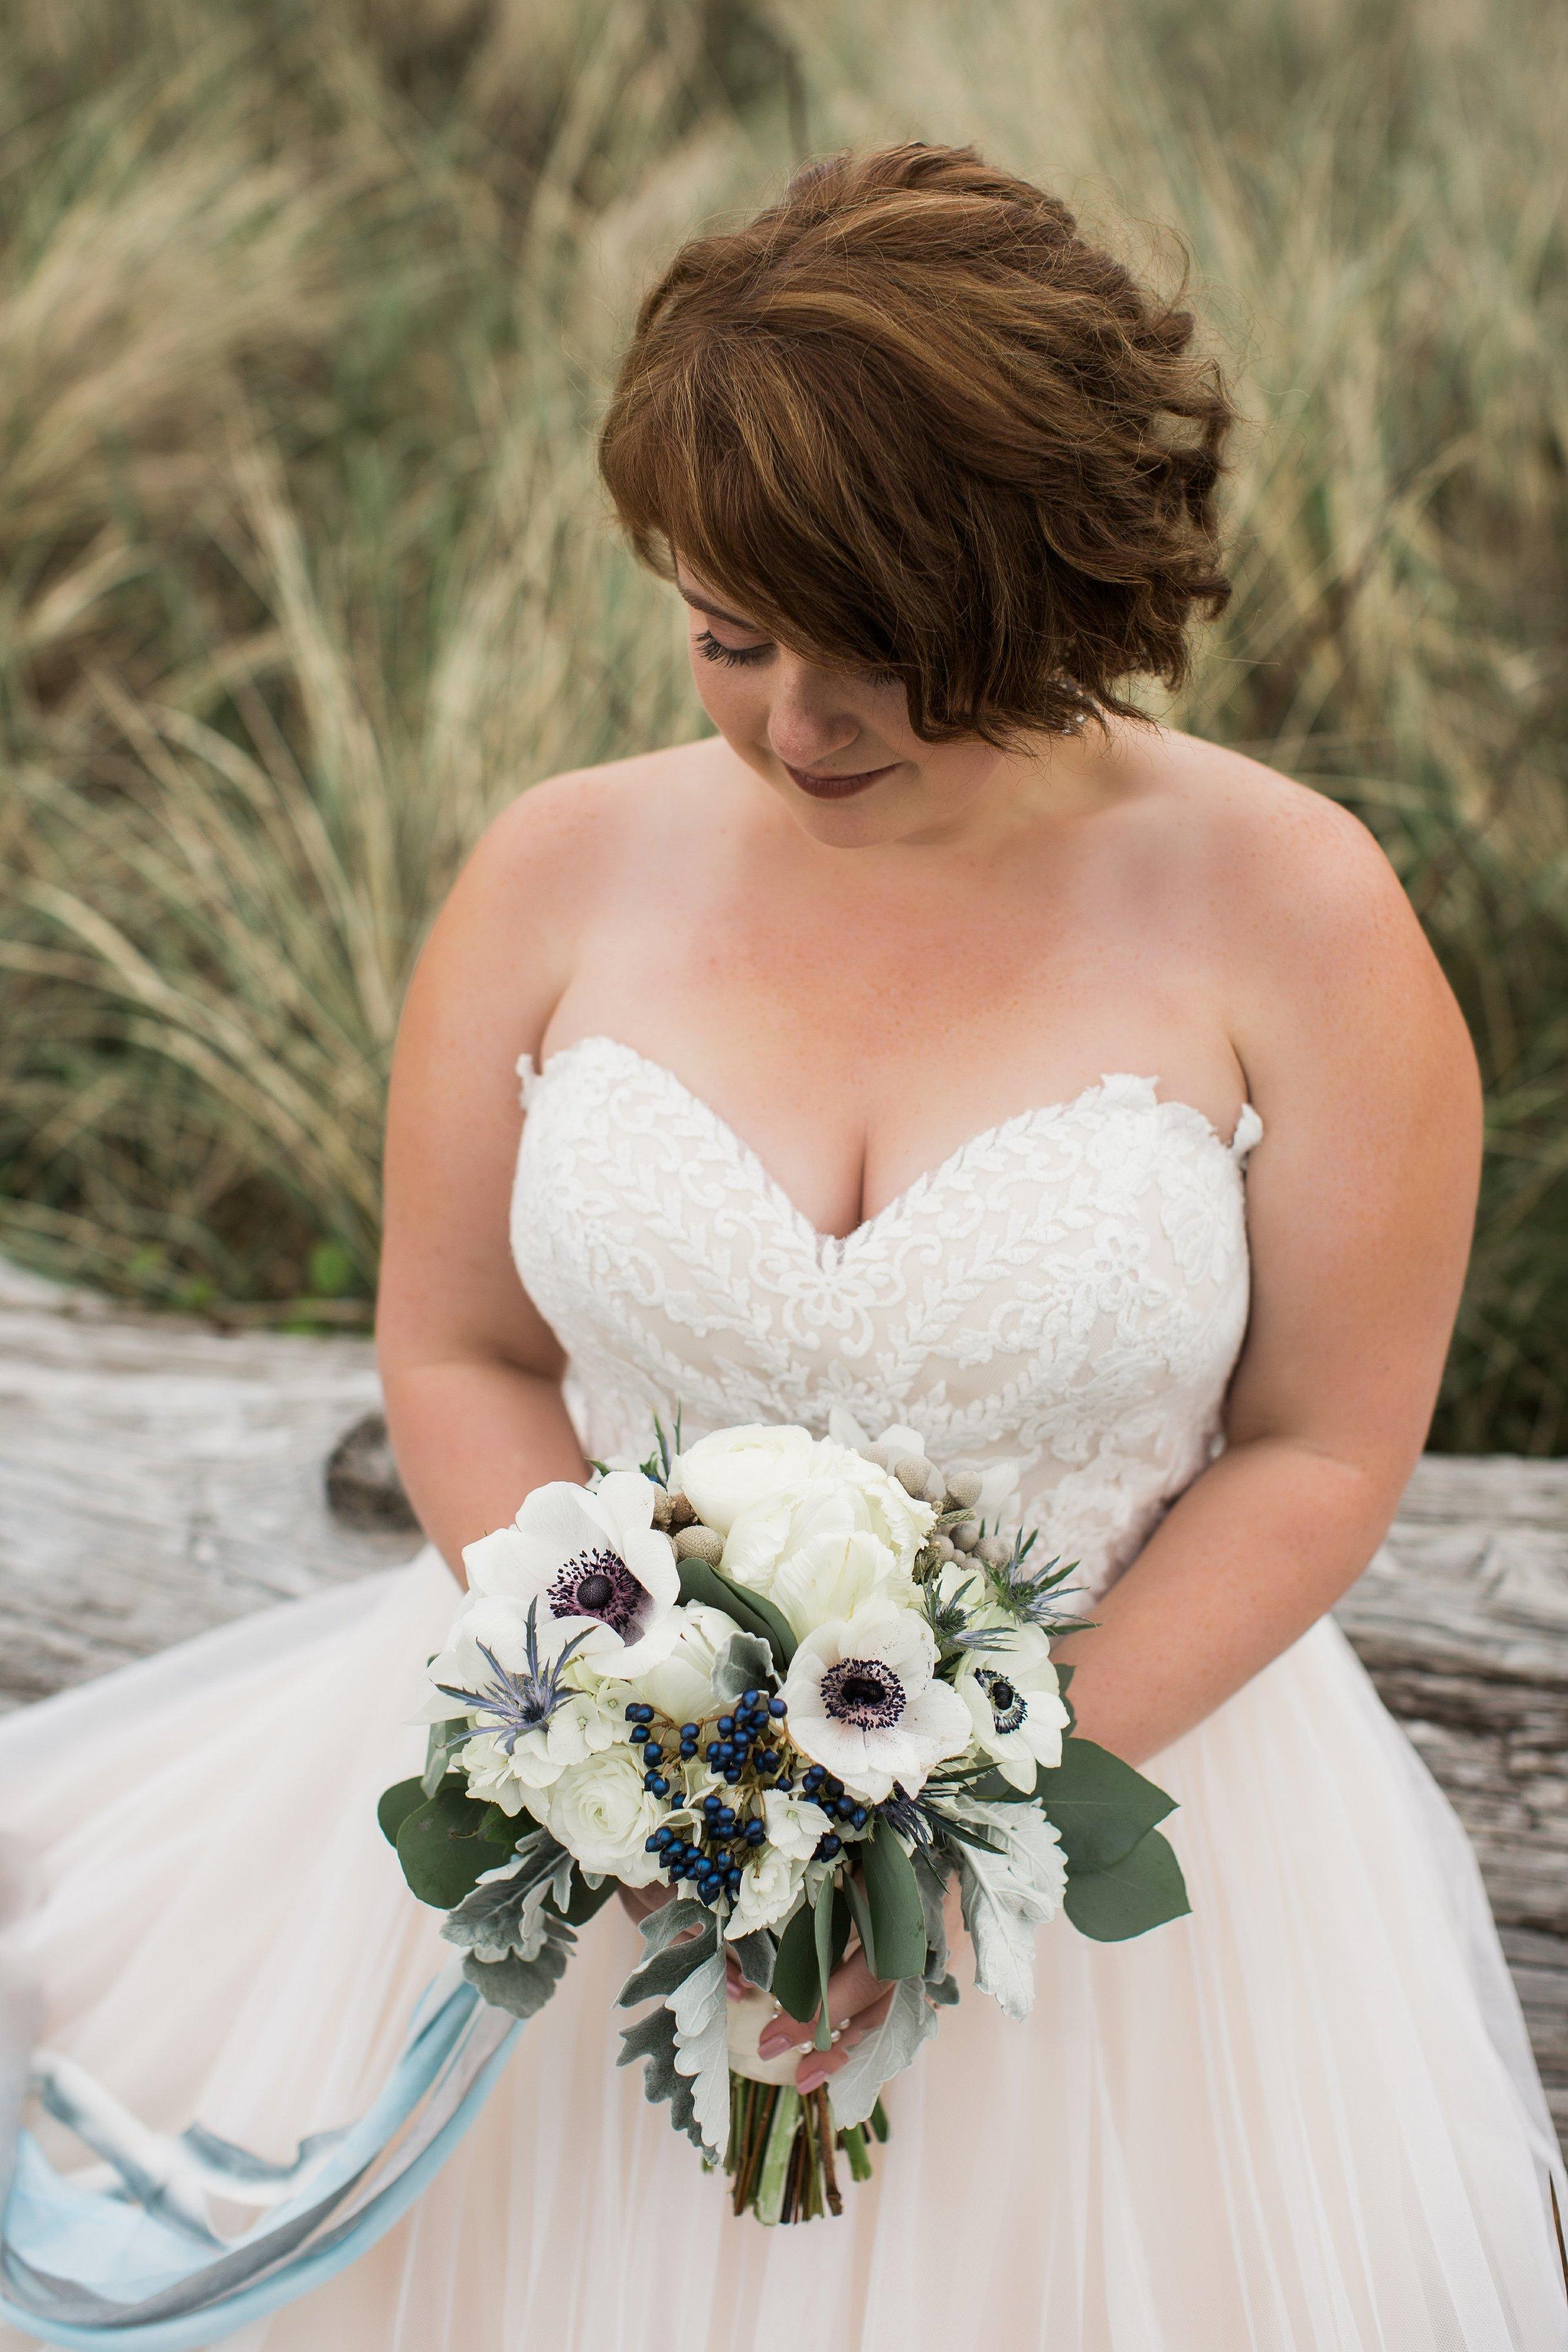 Megan Montalvo Photography